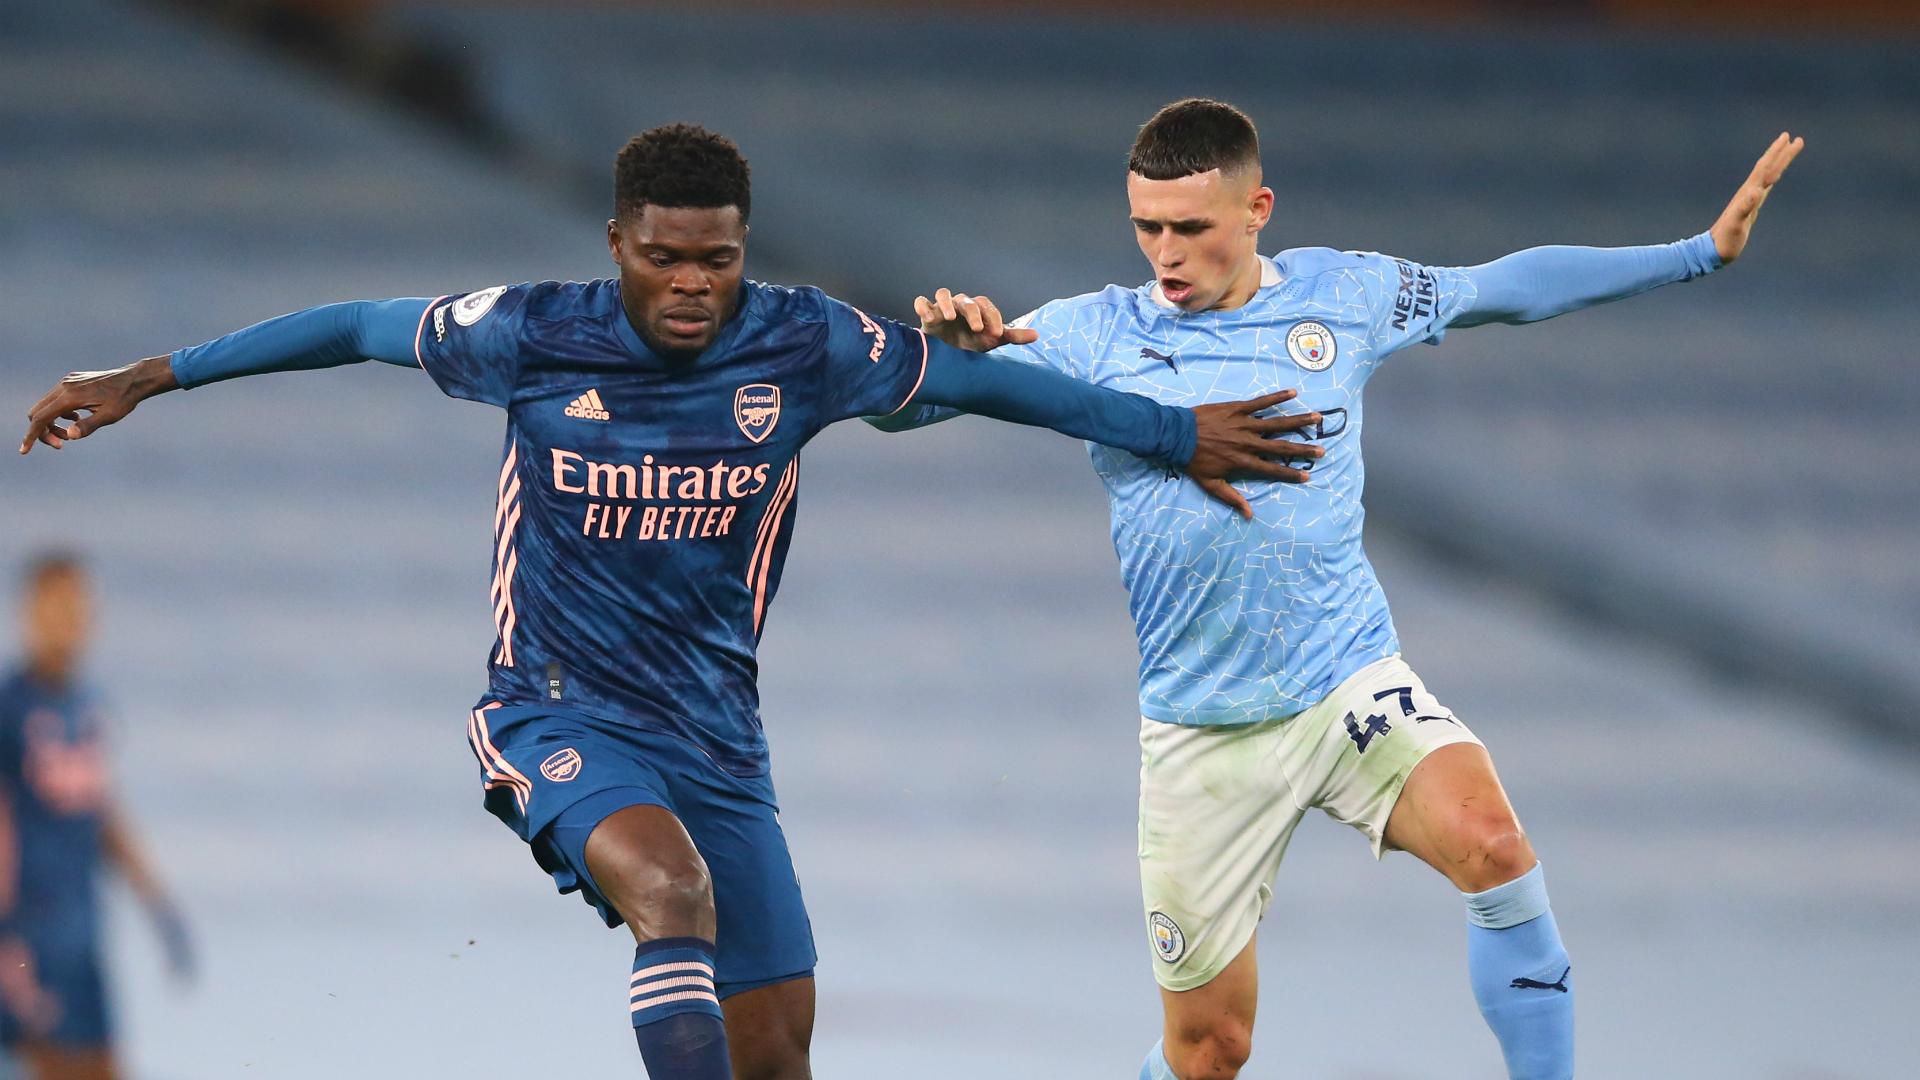 Arsenal boss Arteta: Why Partey did not start against Manchester City